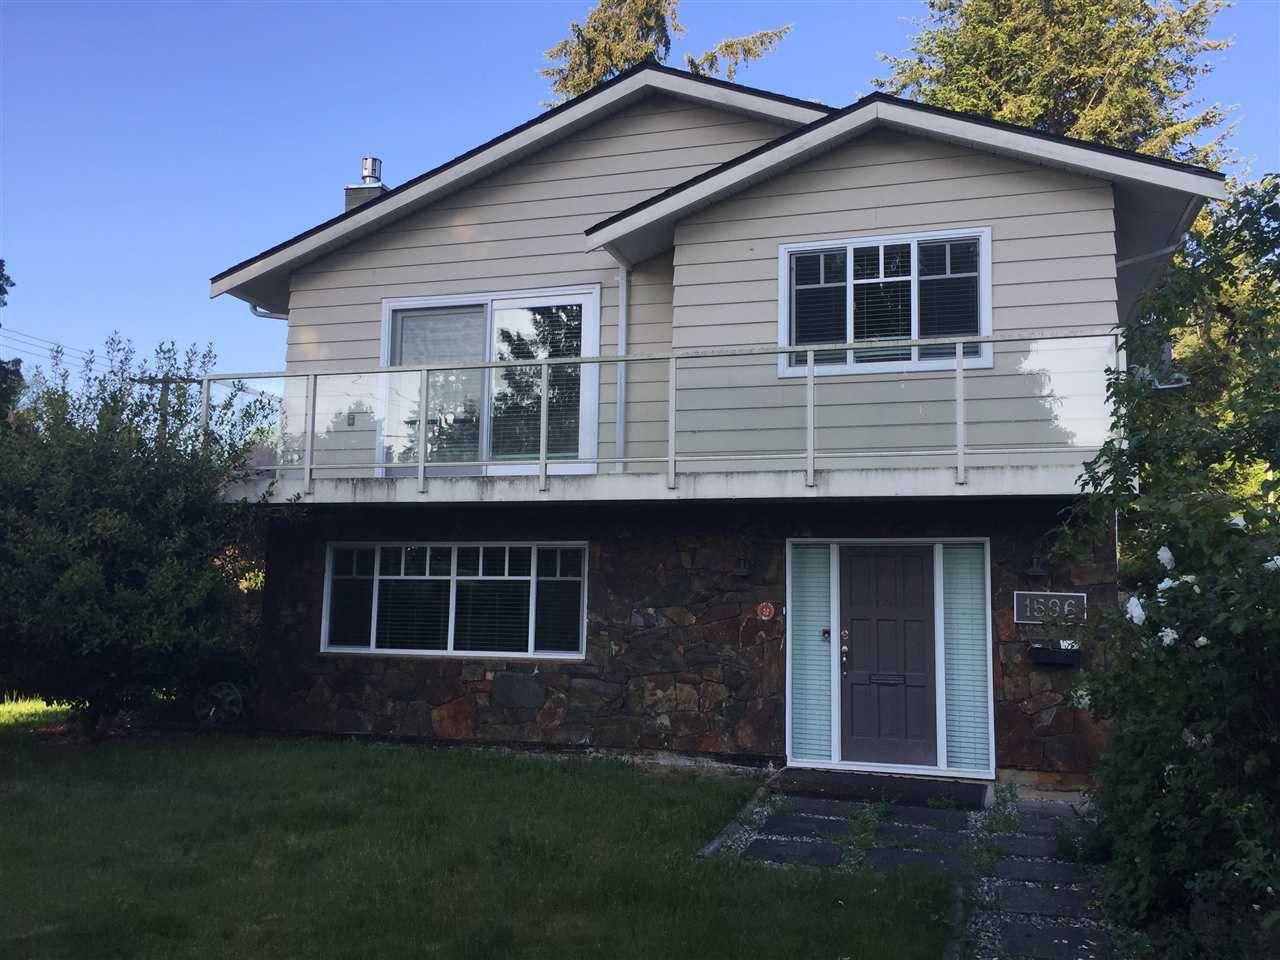 Main Photo: 1596 GILLESPIE Road in Delta: Beach Grove House for sale (Tsawwassen)  : MLS®# R2269997